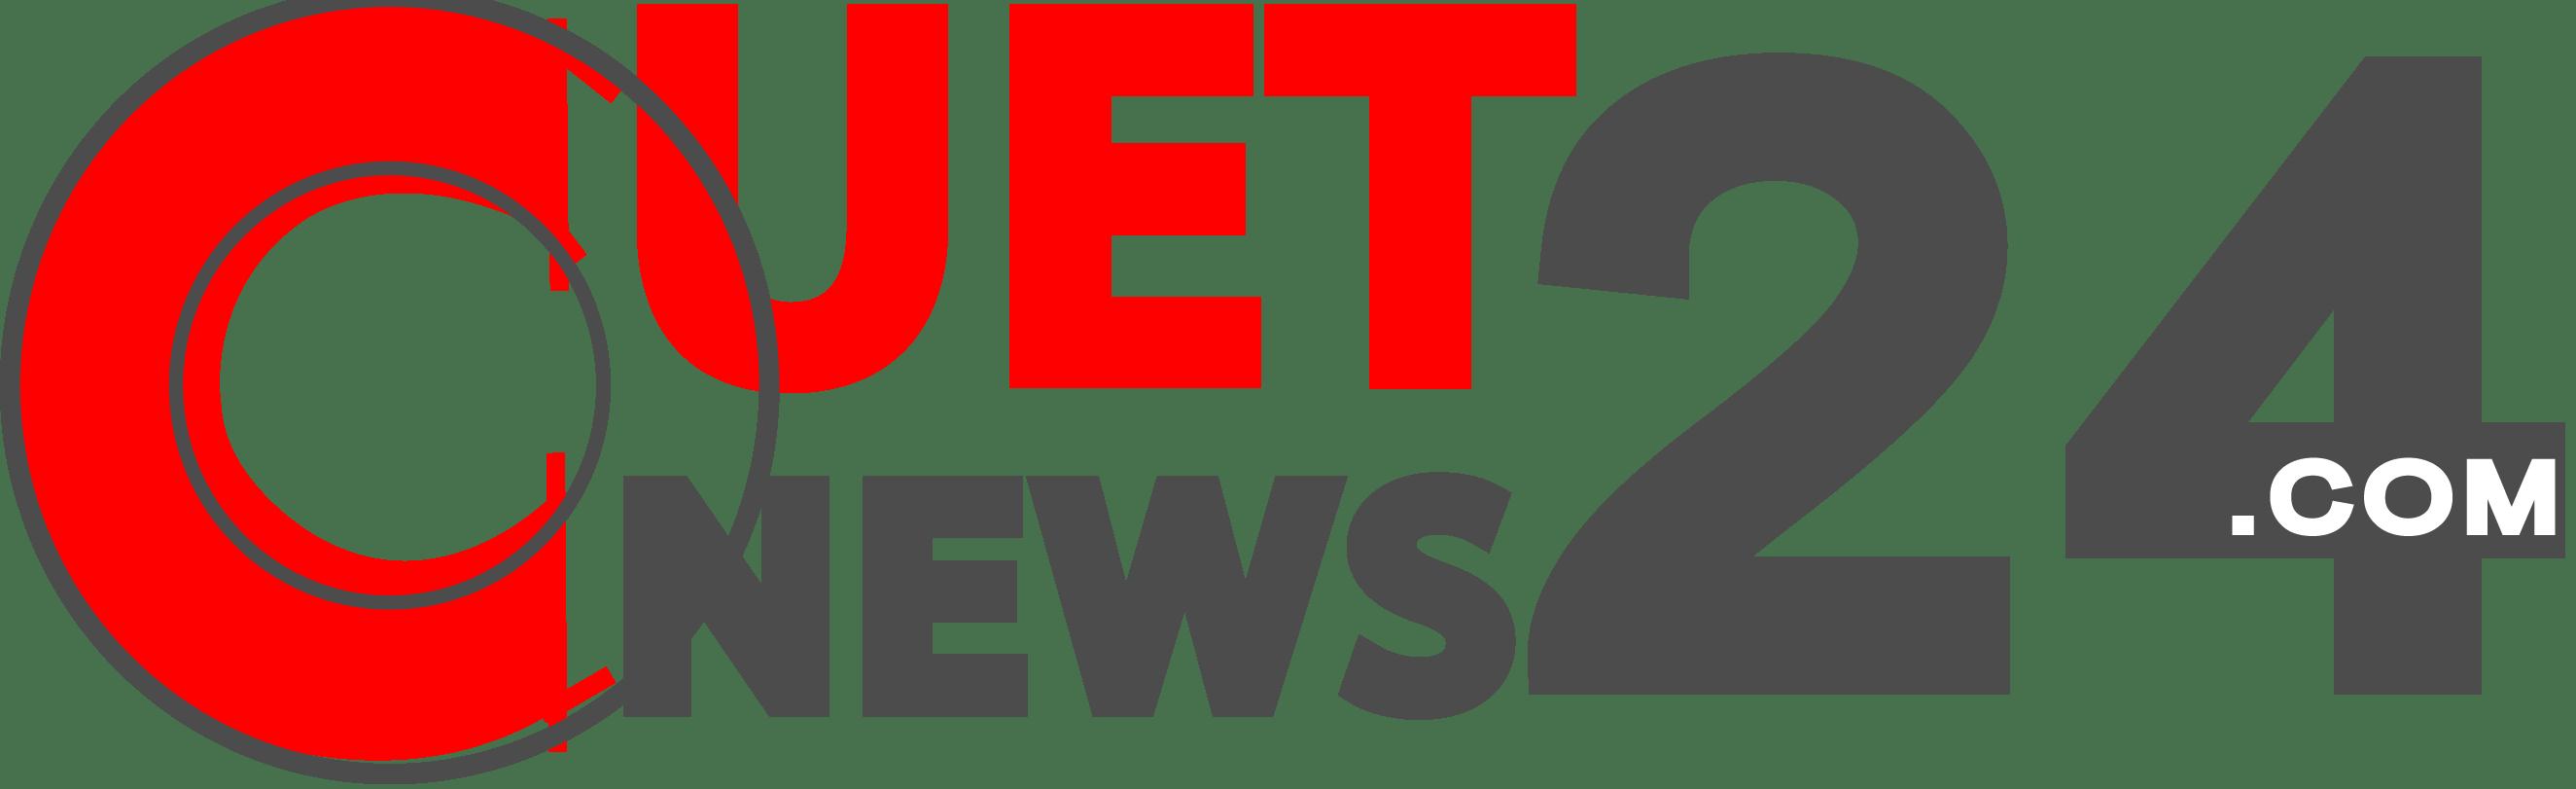 CUET NEWS 24